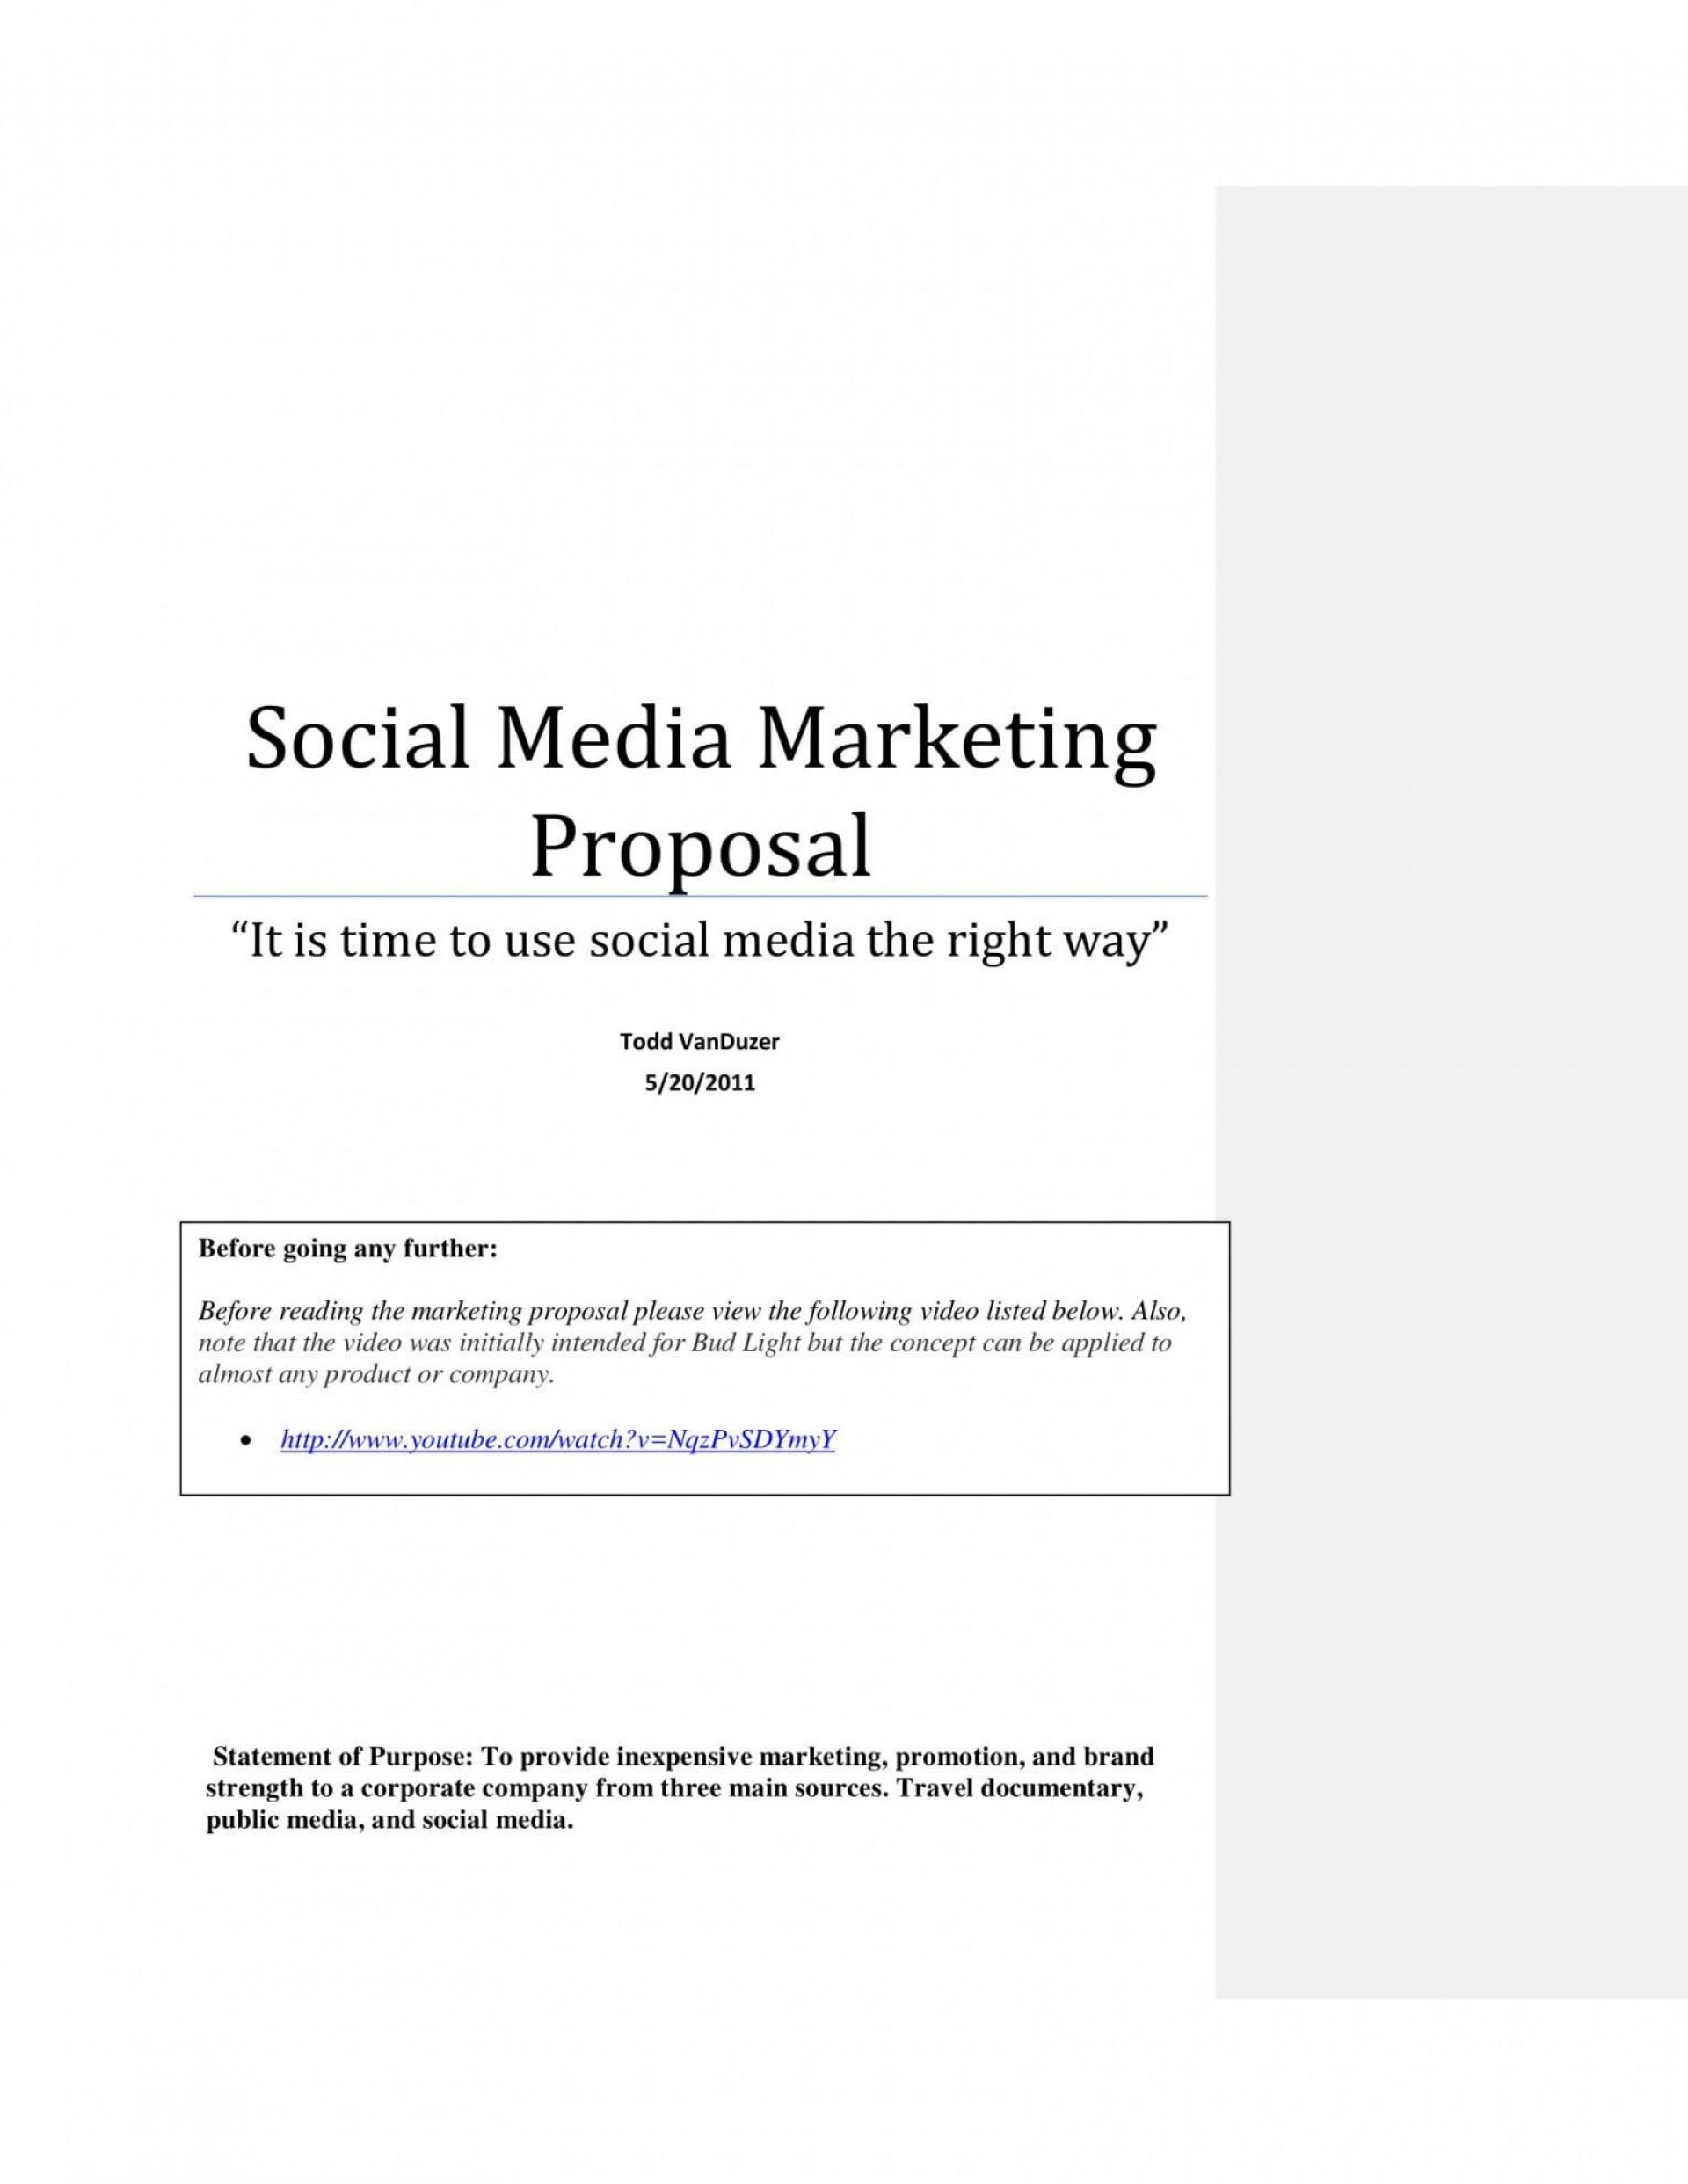 006 Beautiful Social Media Marketing Proposal Template Word Design  Plan1920